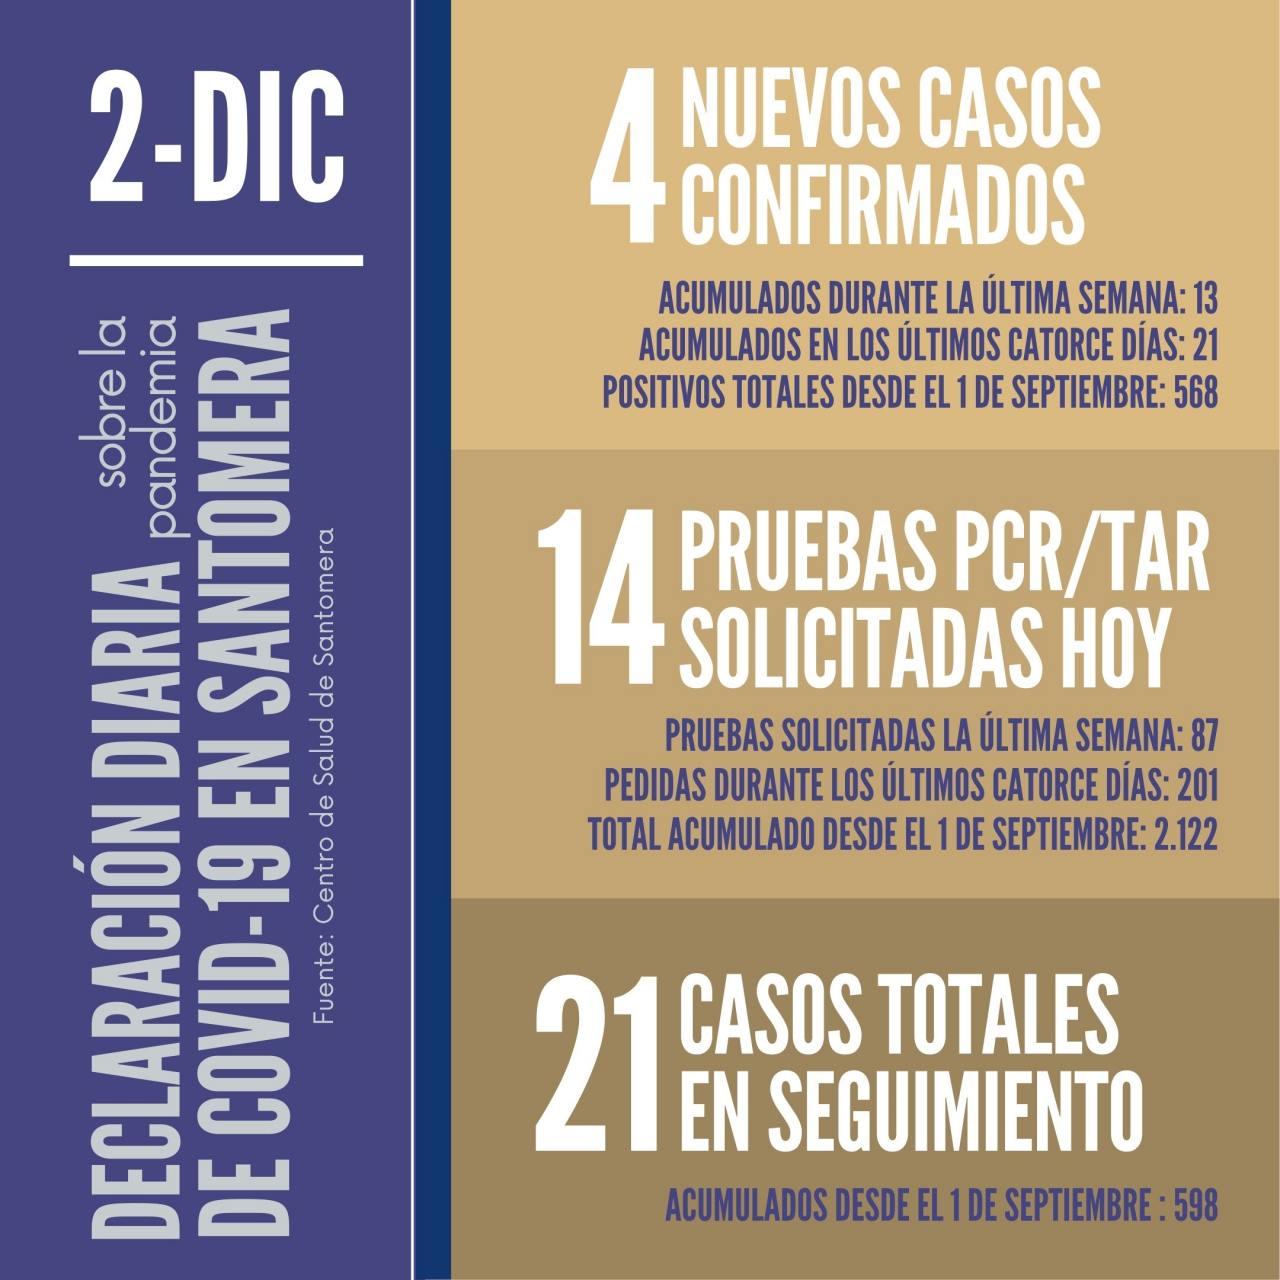 20201202_Datos-COVID-19-Santomera